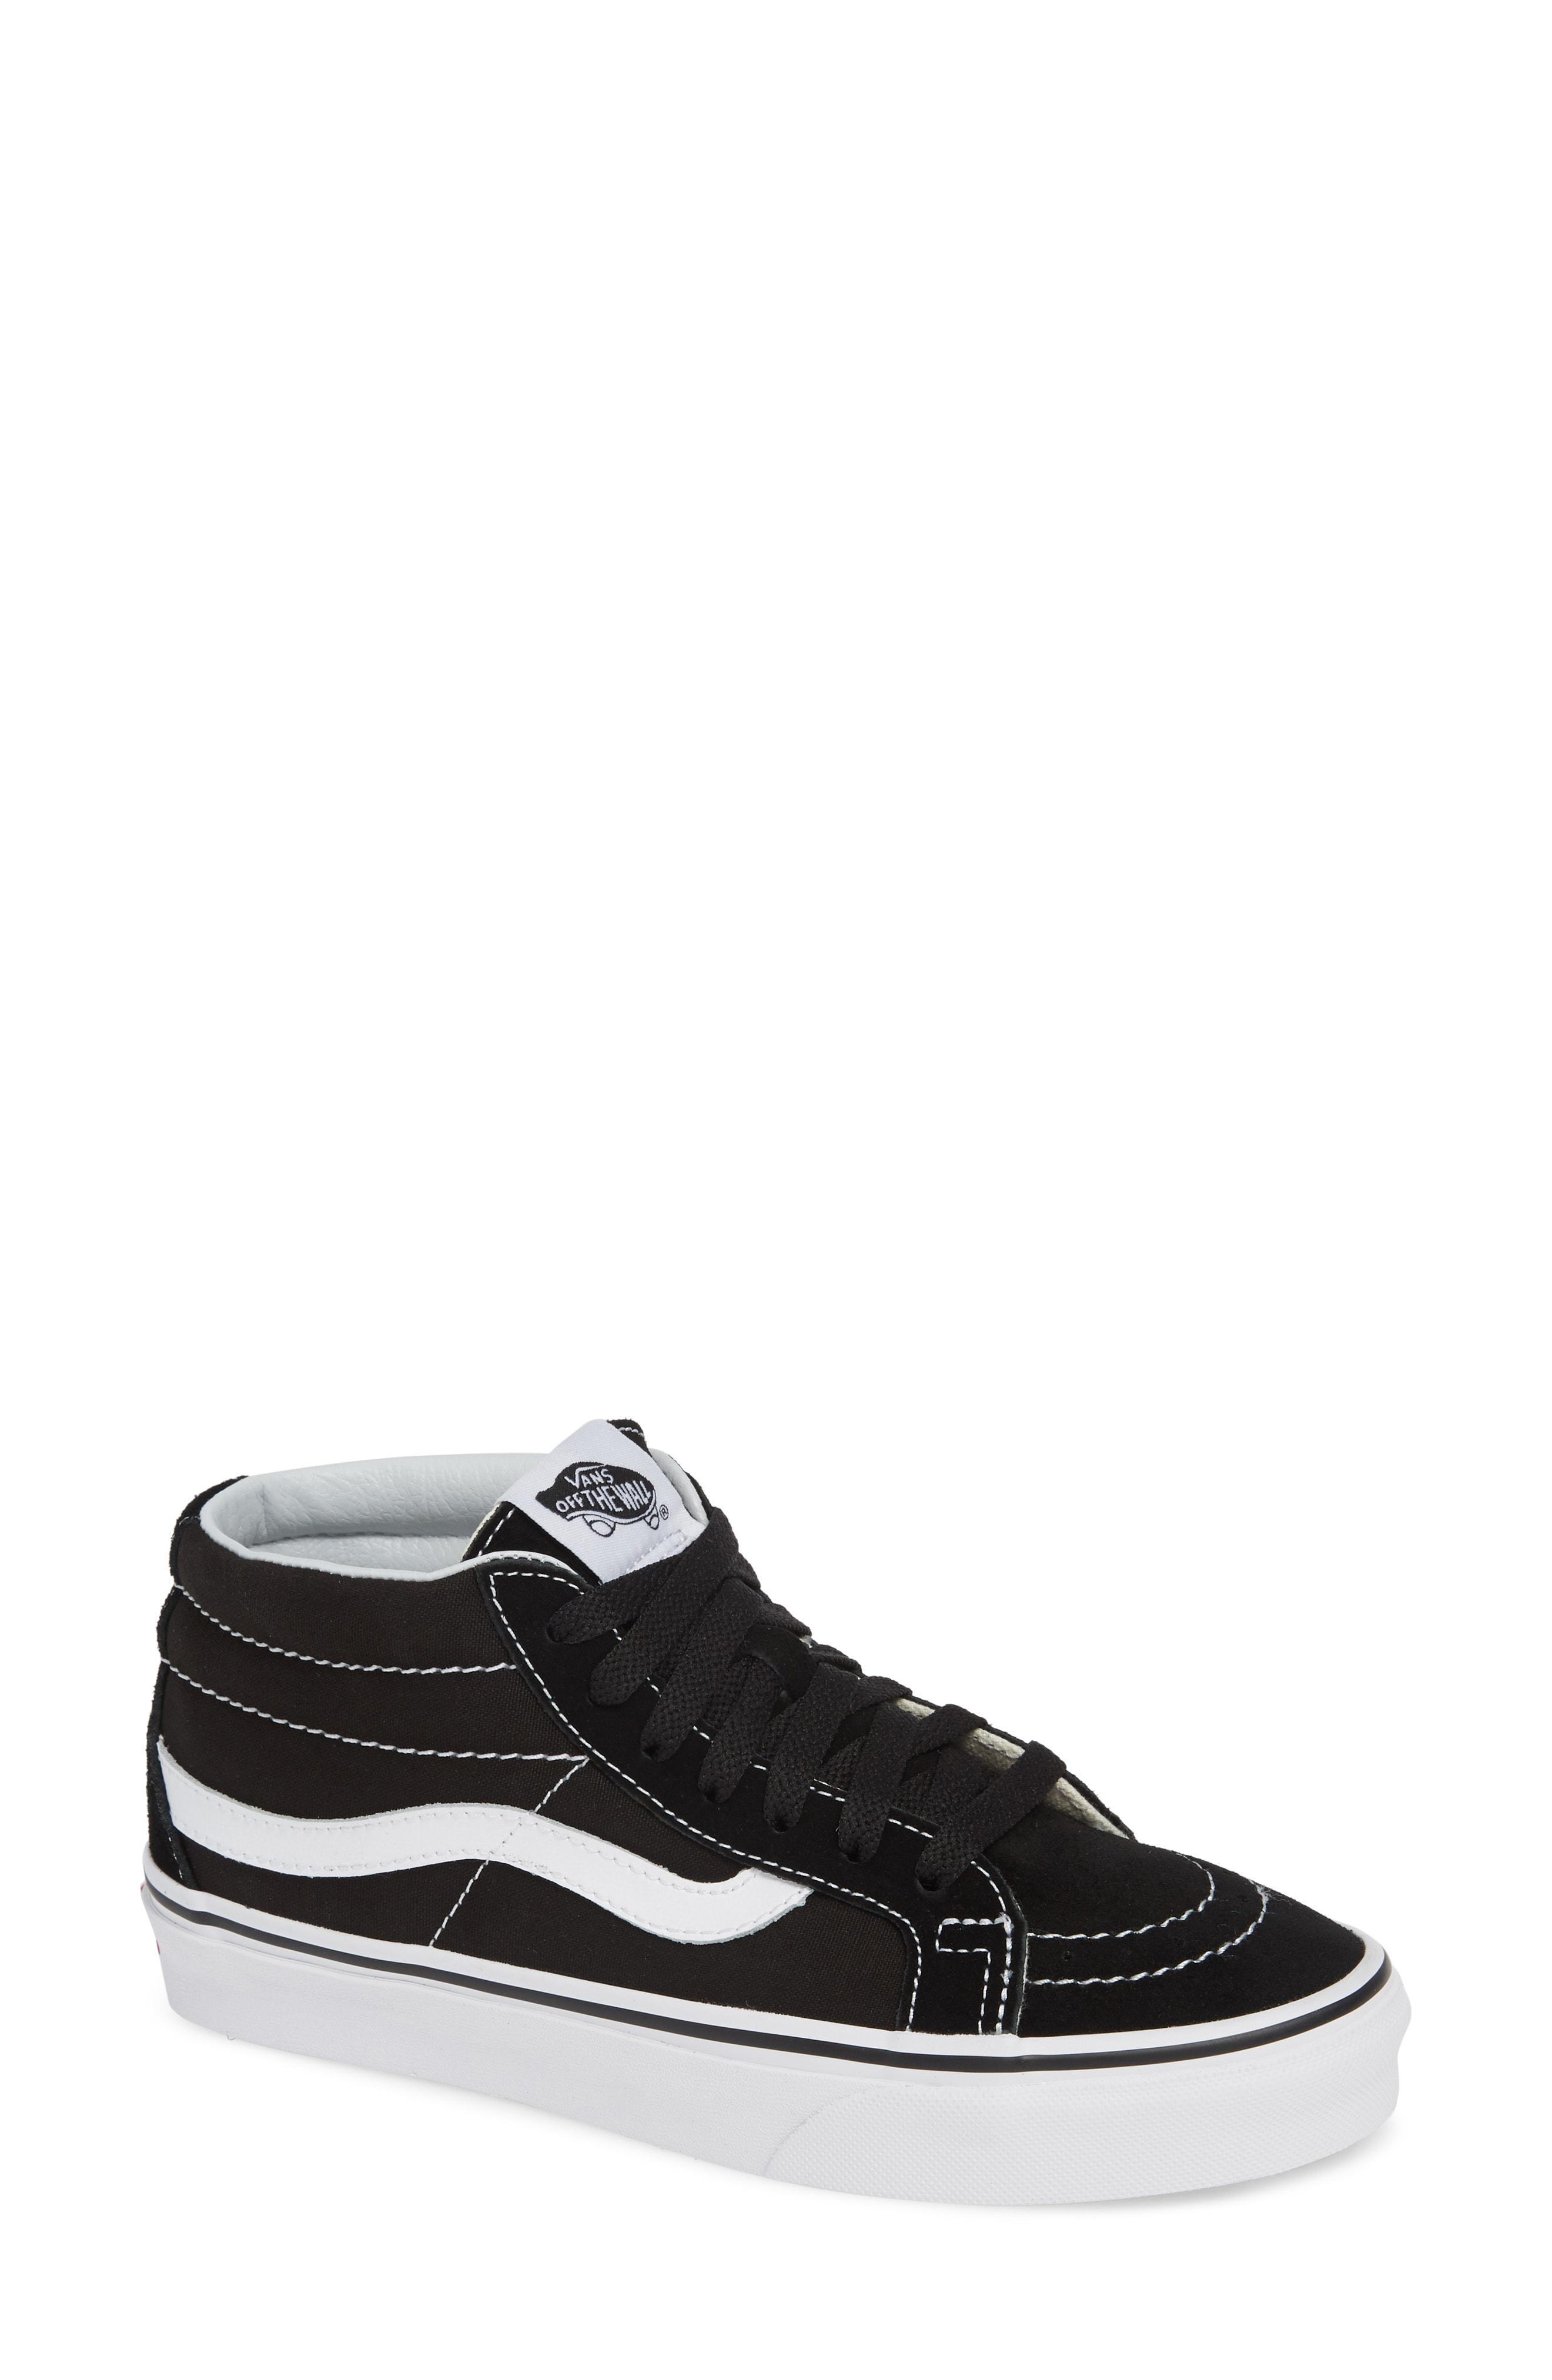 Vans Sk8 Mid Reissue Sneaker (Women)